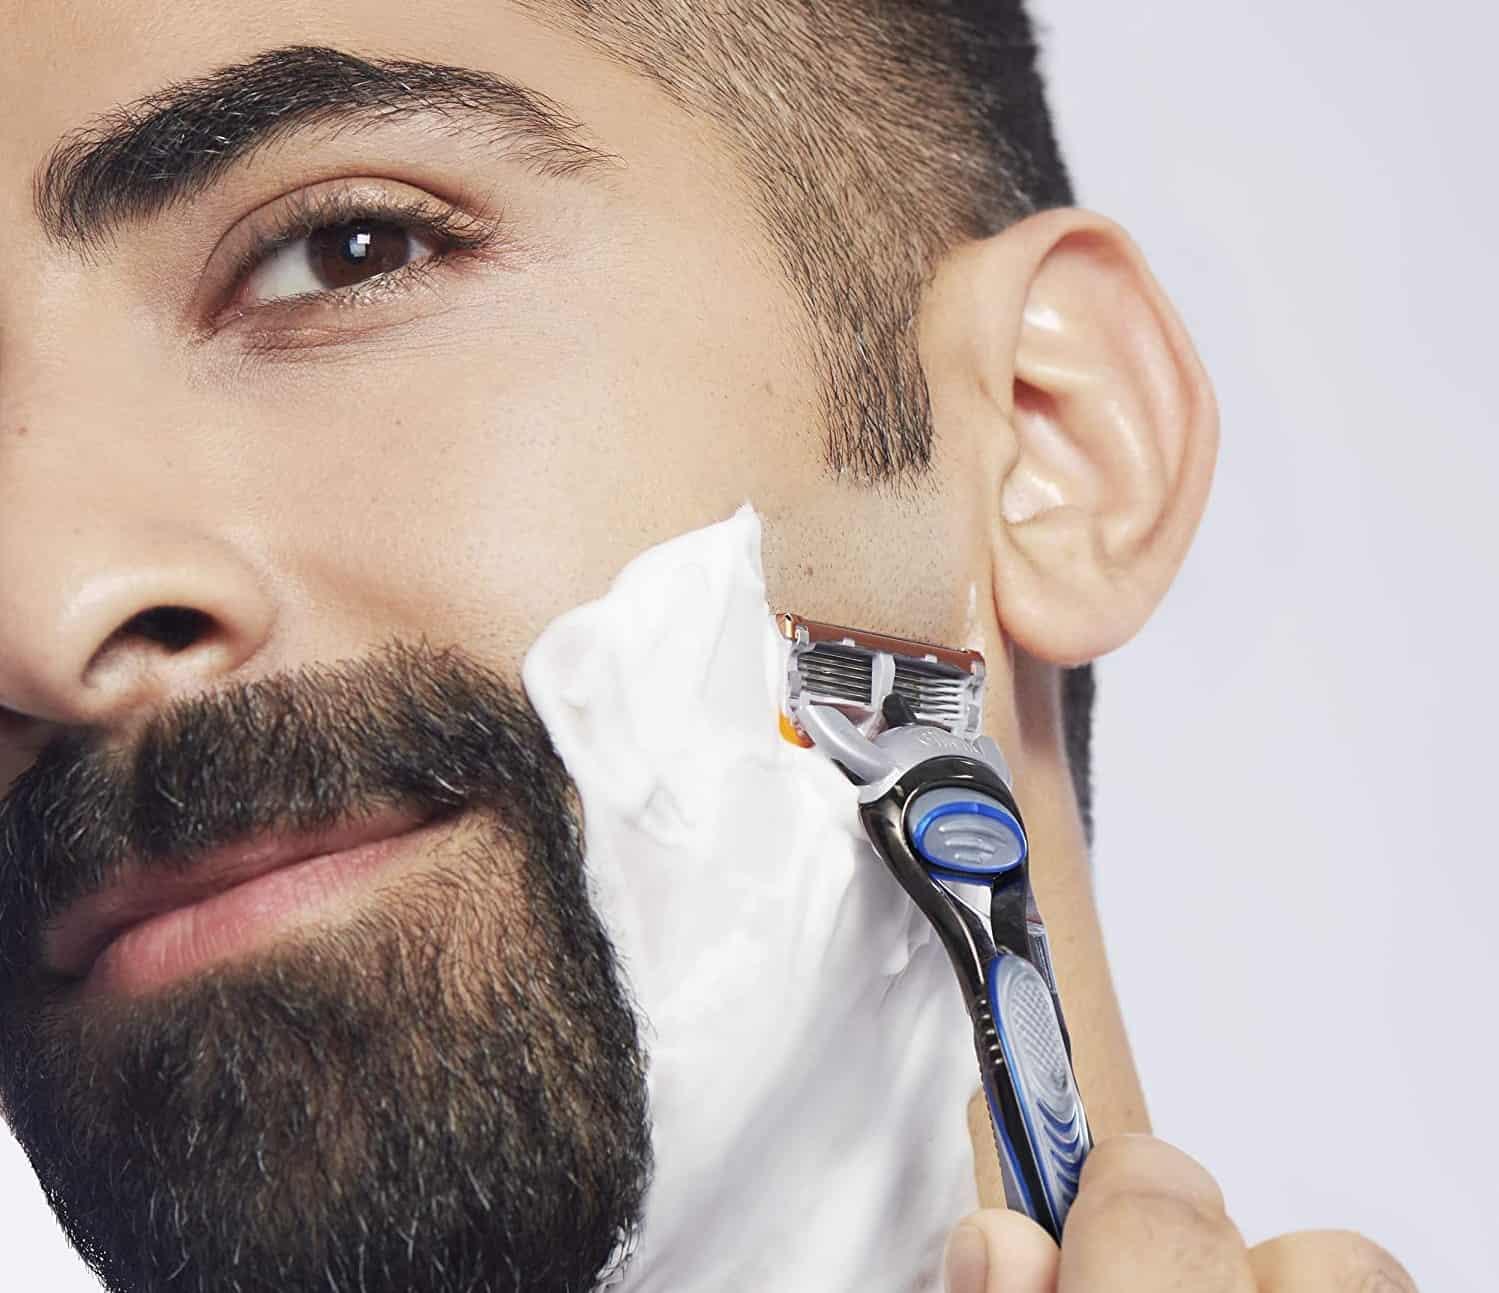 Benefits of Shaving With Gillette Cartridge Razors